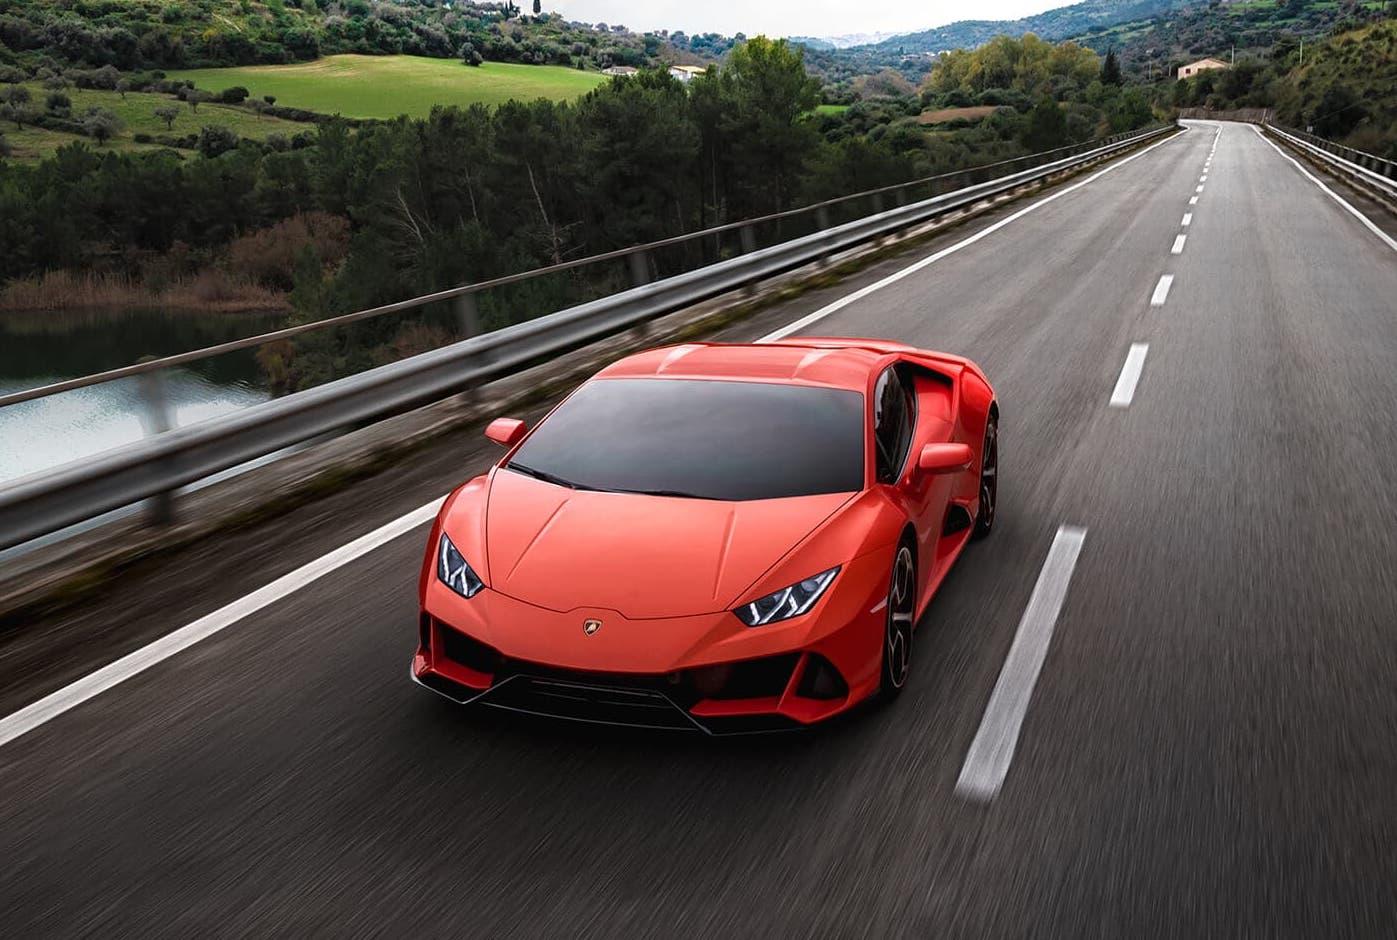 2020 Lamborghini Huracan Evo Revealed Exotic Car List